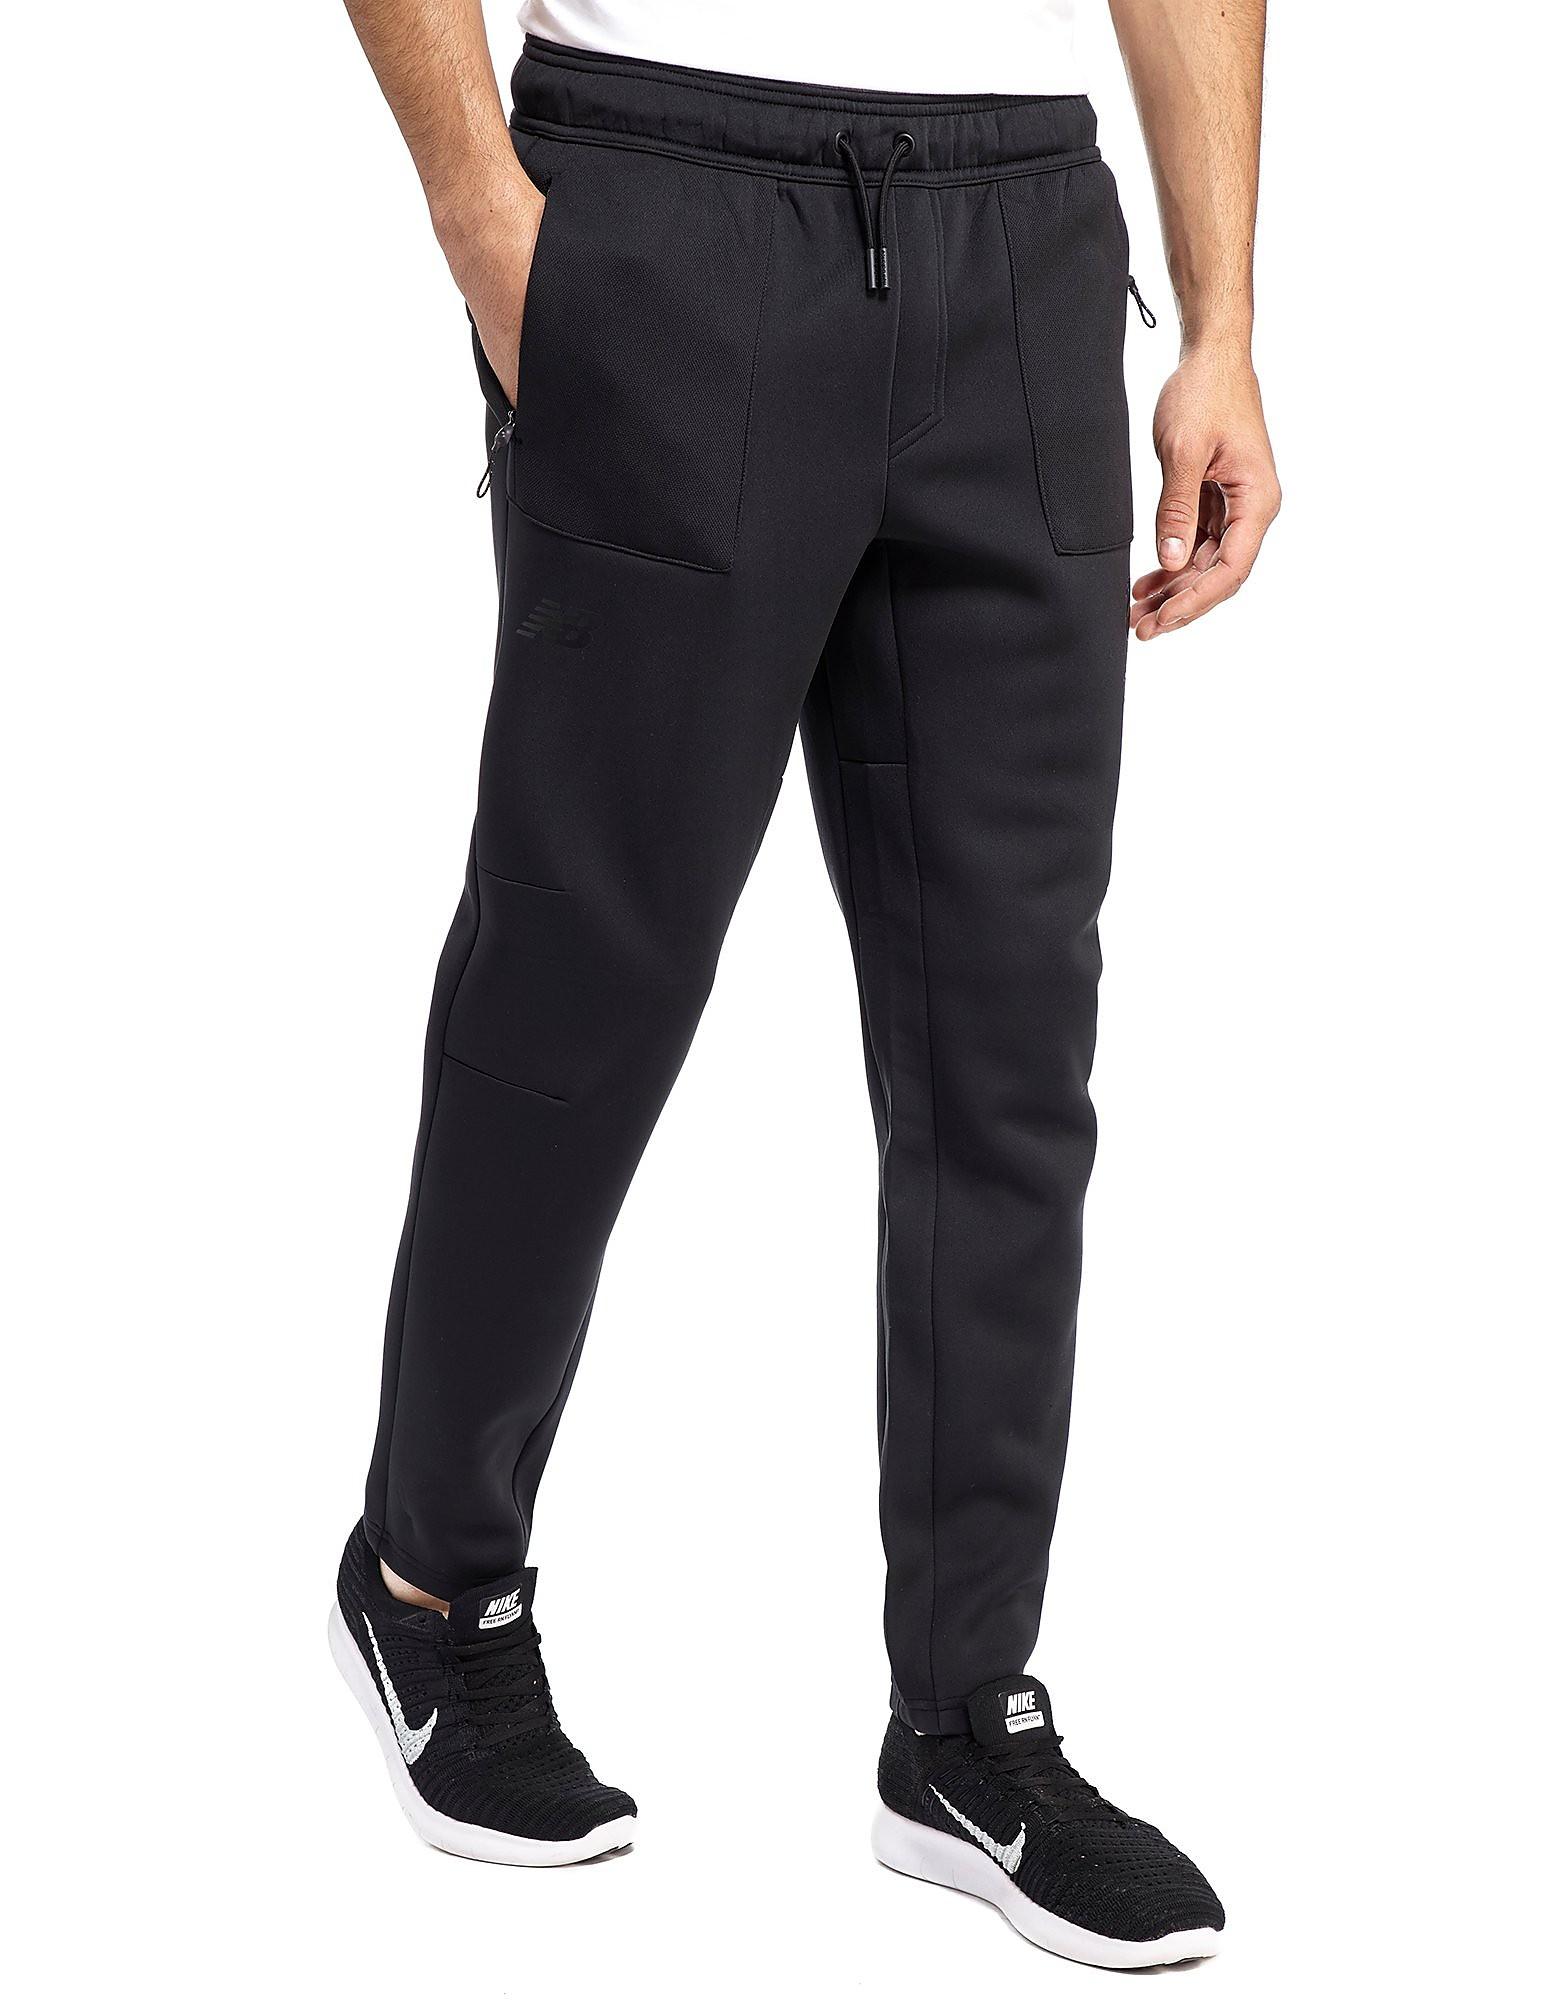 New Balance Pantalon 247 Liverpool FC Homme - noir, noir